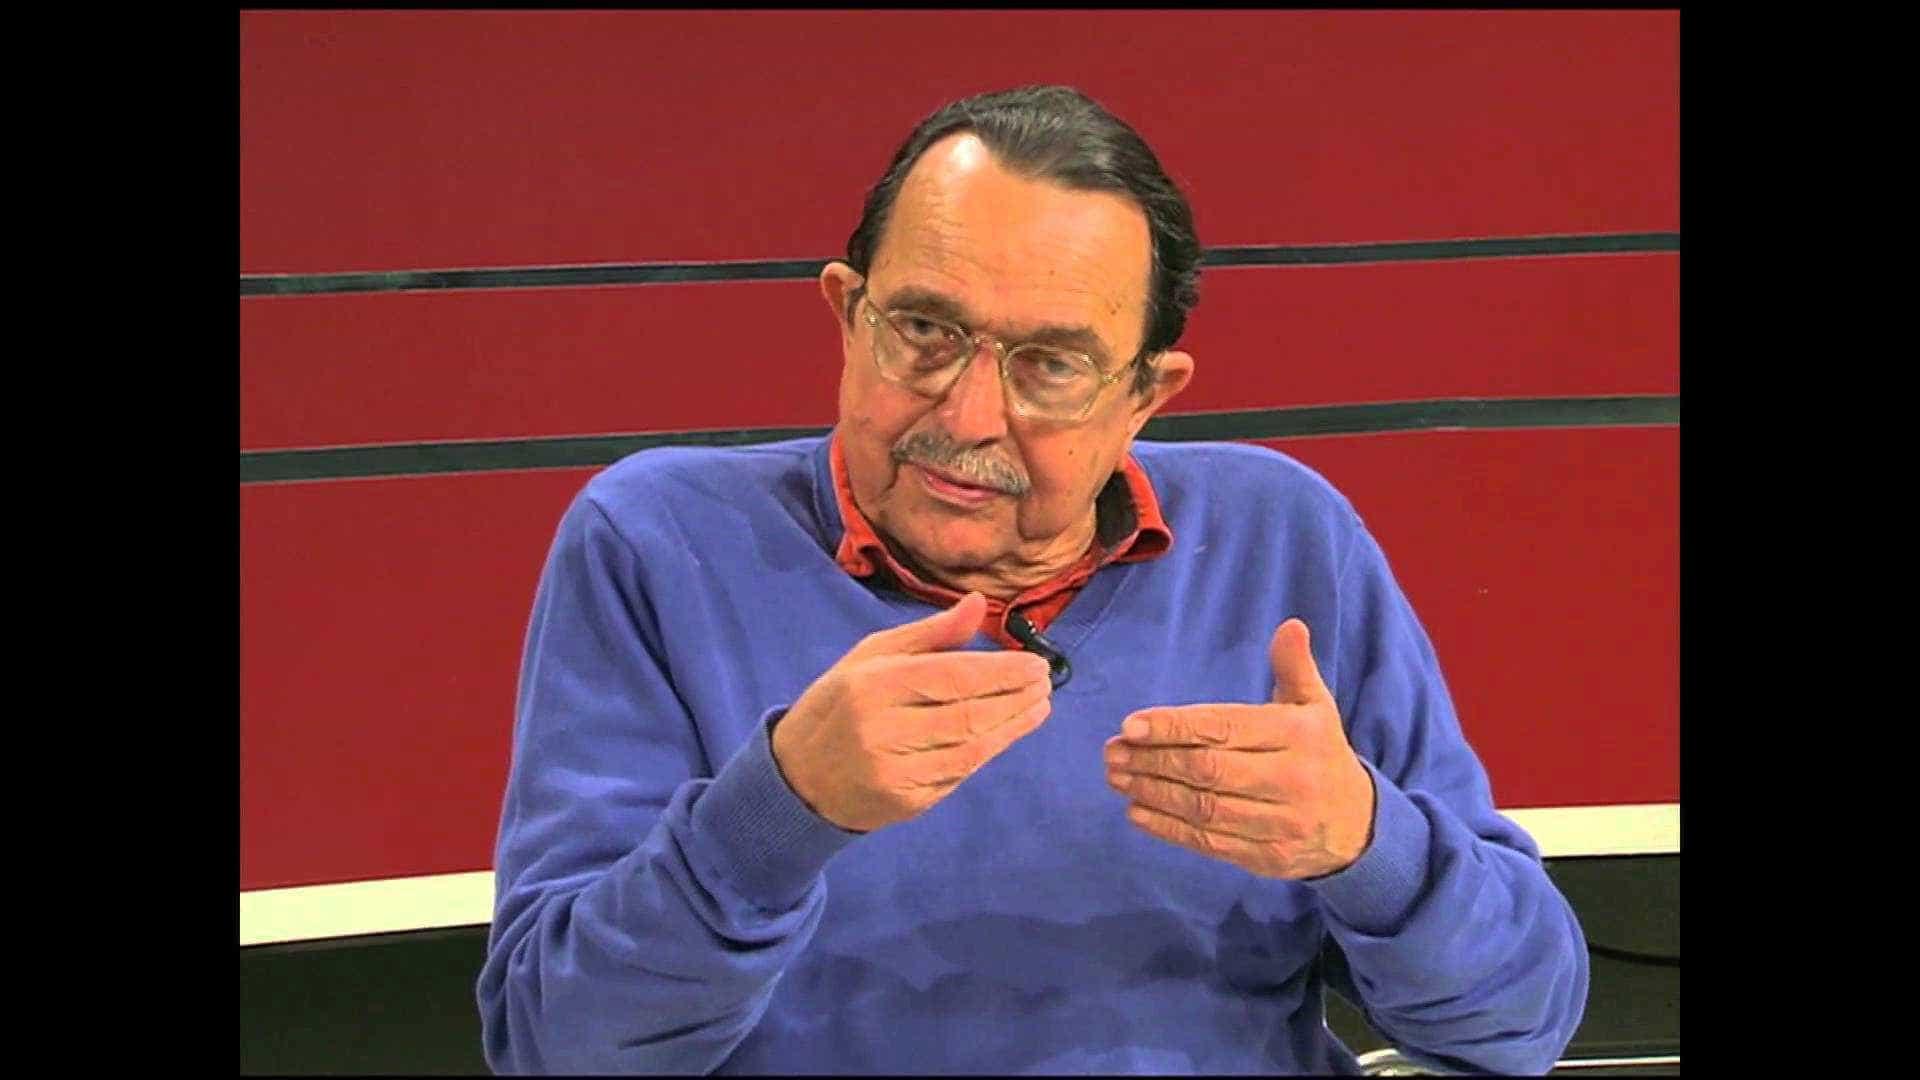 Carlos Araújo, ex-marido de Dilma, morre em Porto Alegre